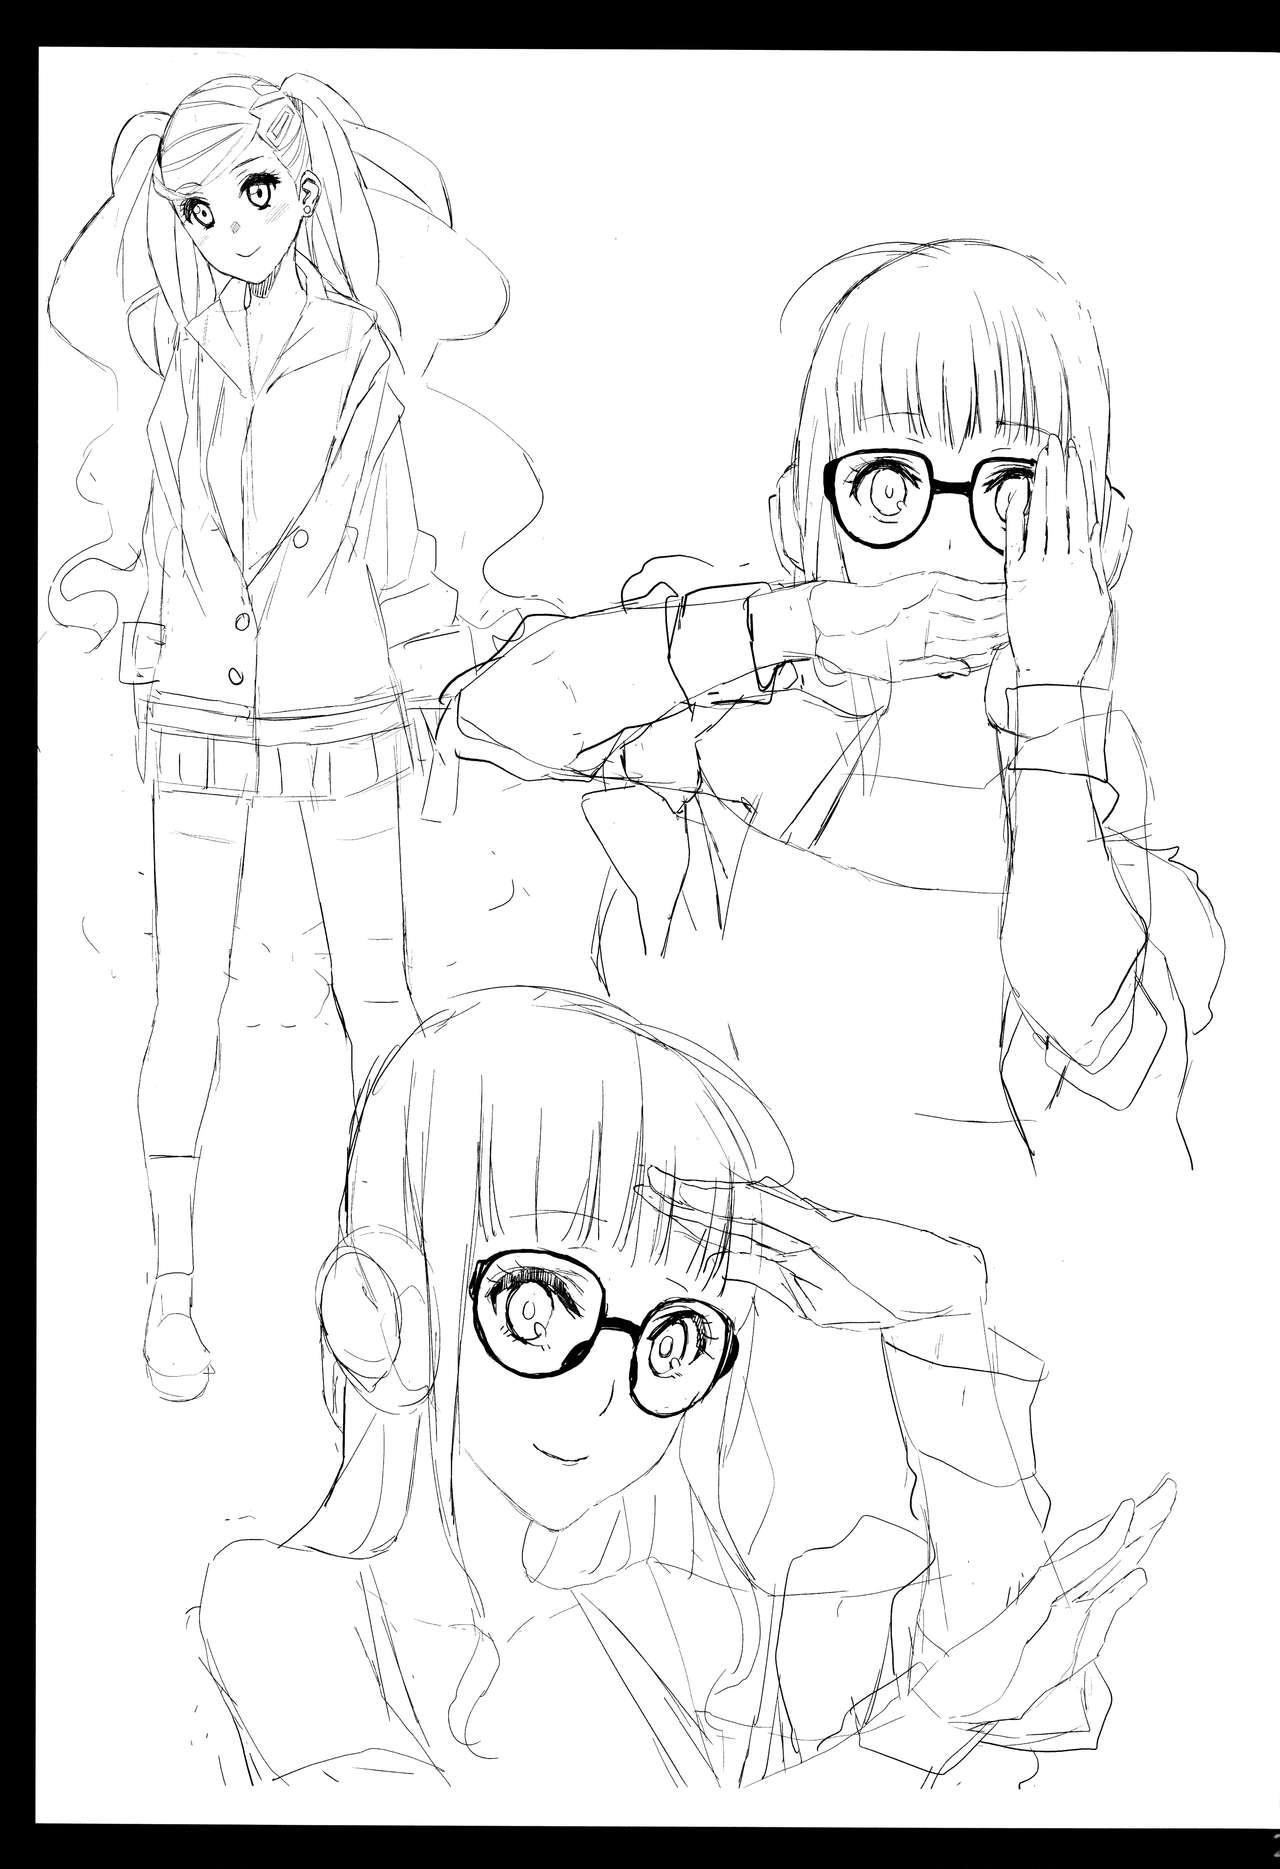 Panther - Kaitou no Shikkaku 27